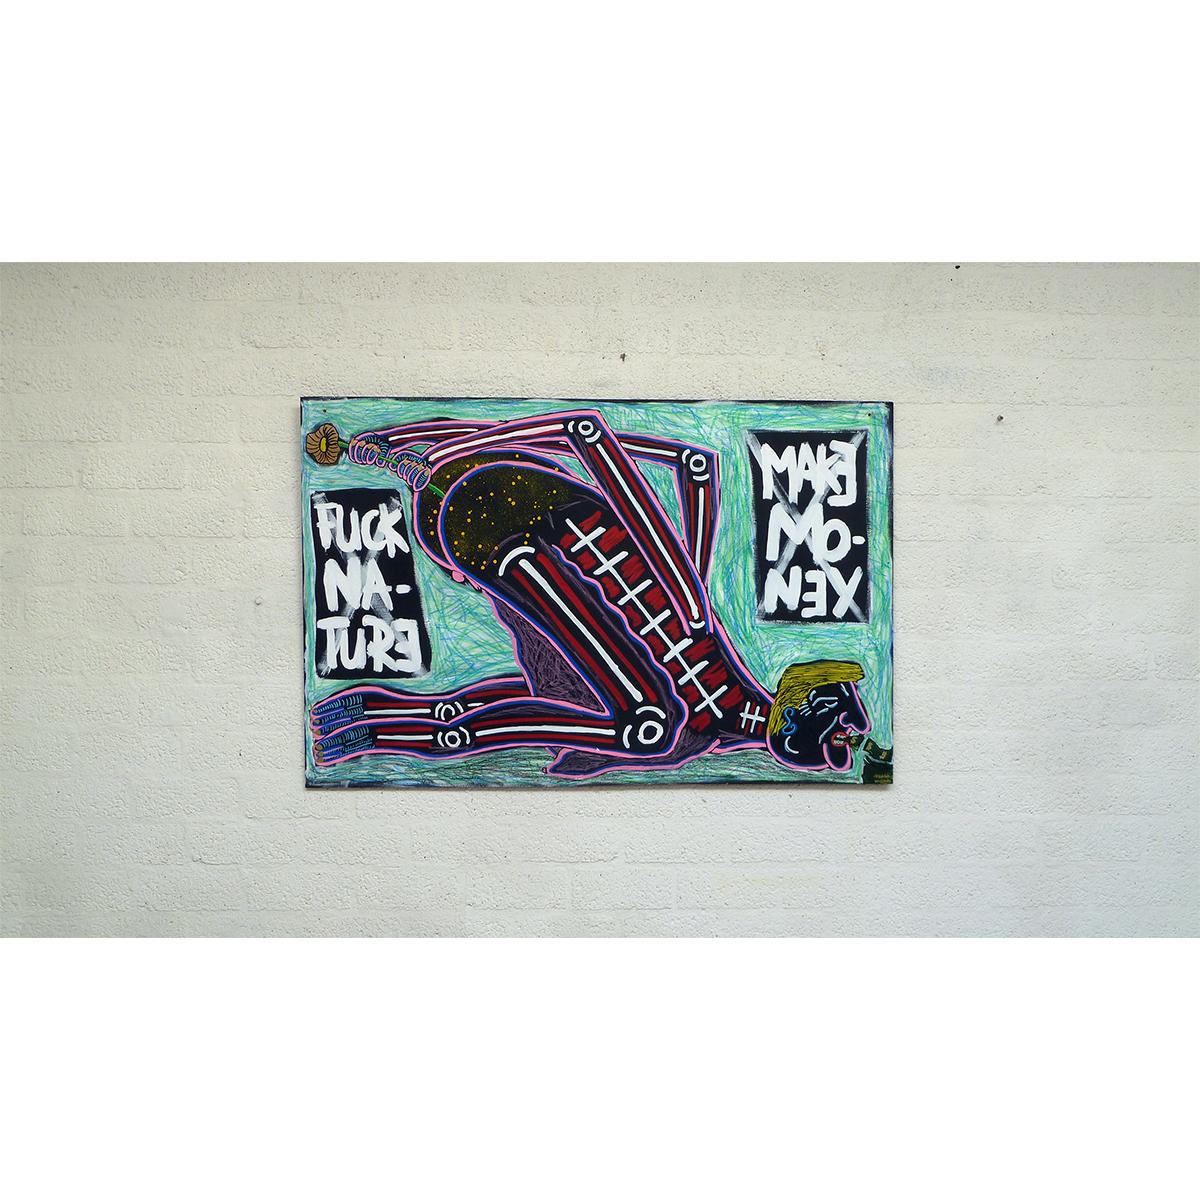 FUCK NATURE, MAKE MONEY 02 - Frank Willems